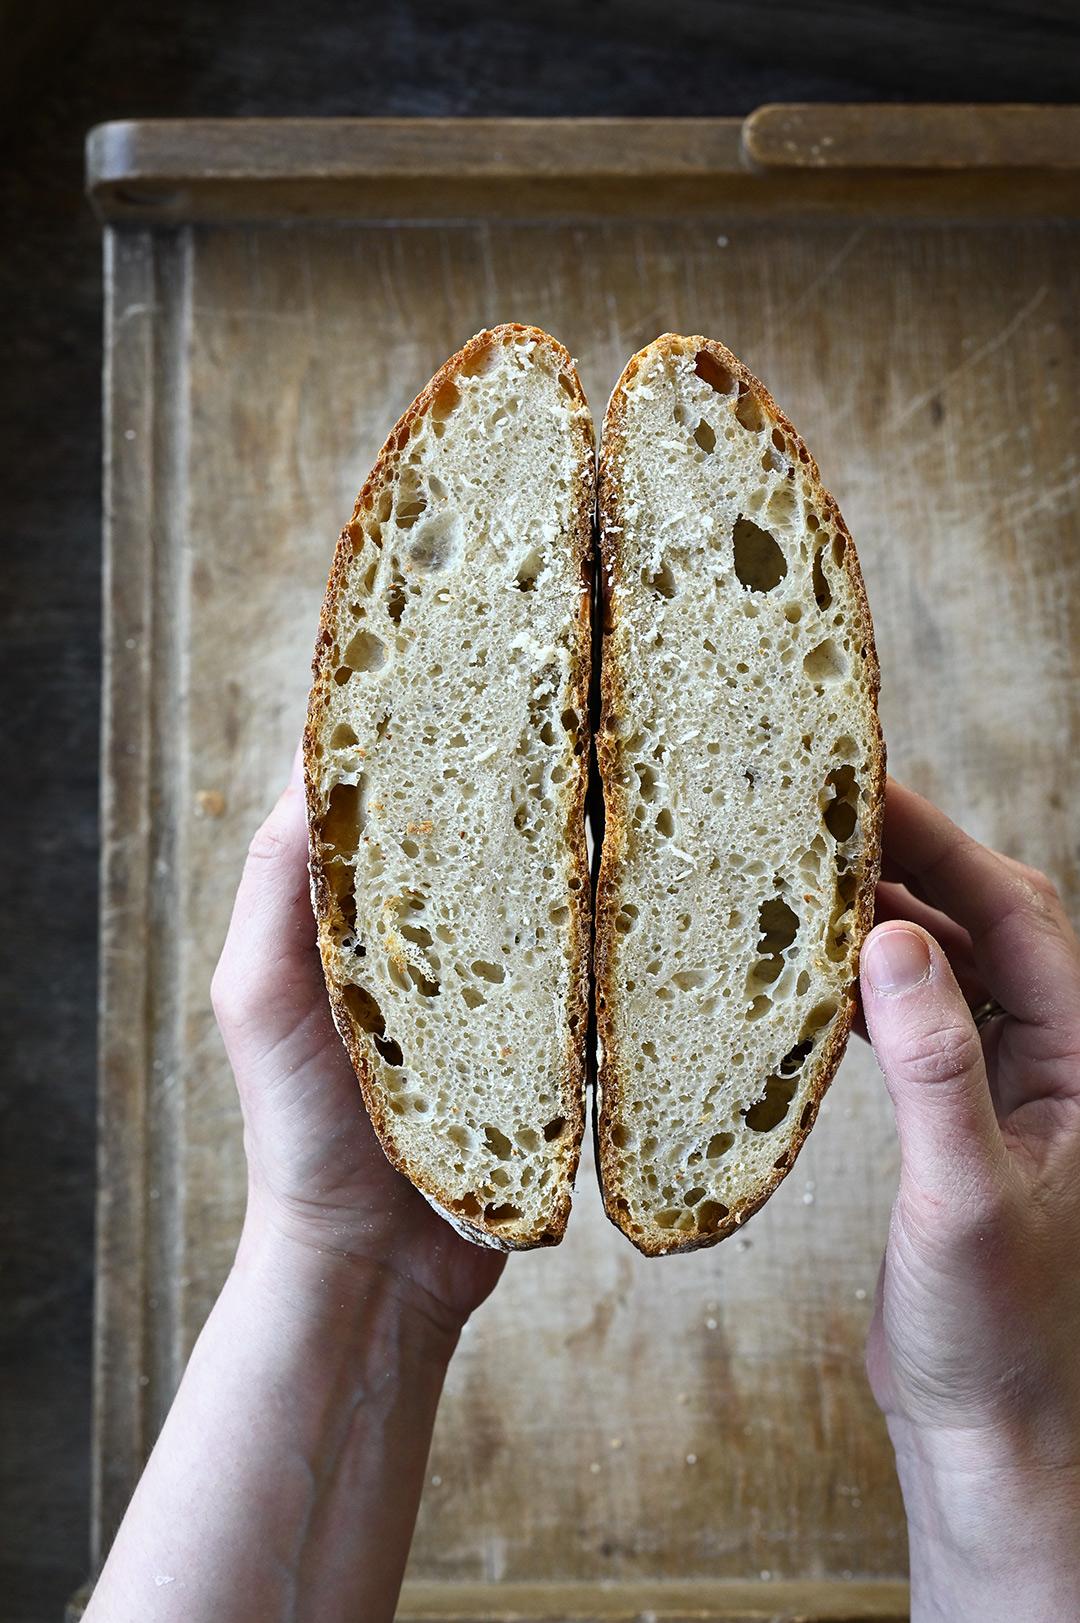 serving dumplings | Homemade sourdough bread